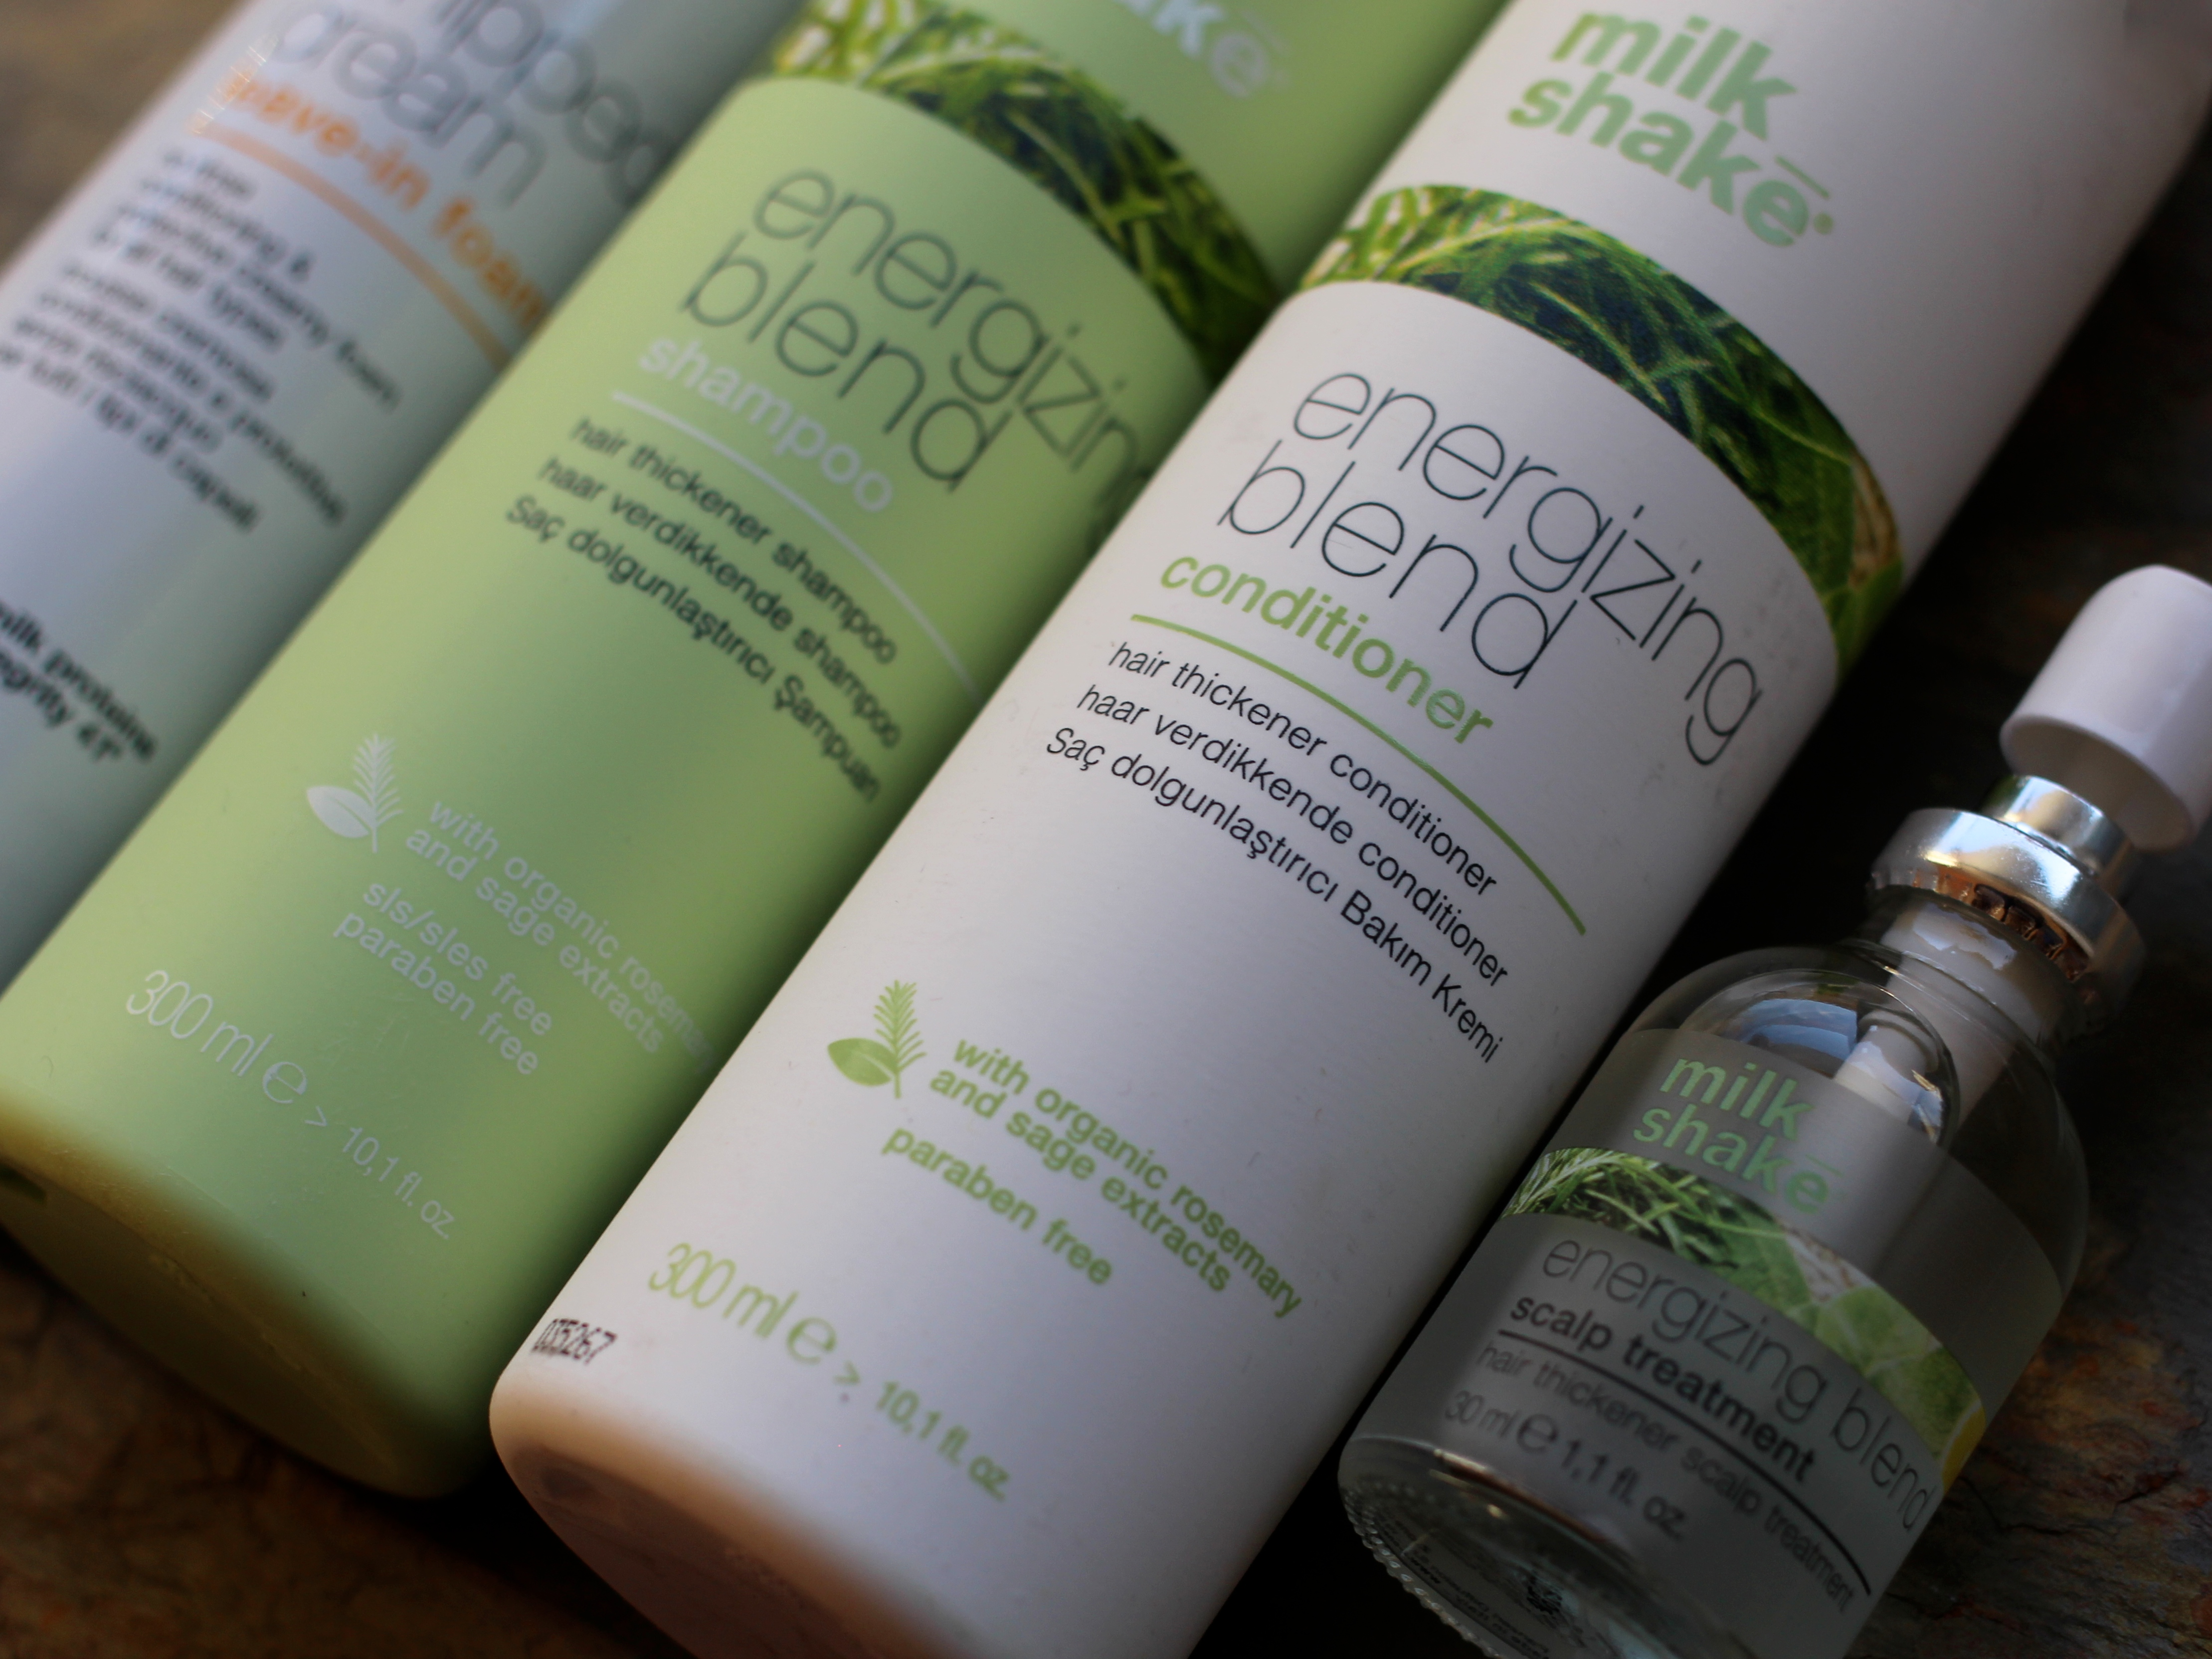 Milkshake Energizing Blend Shampoo Review